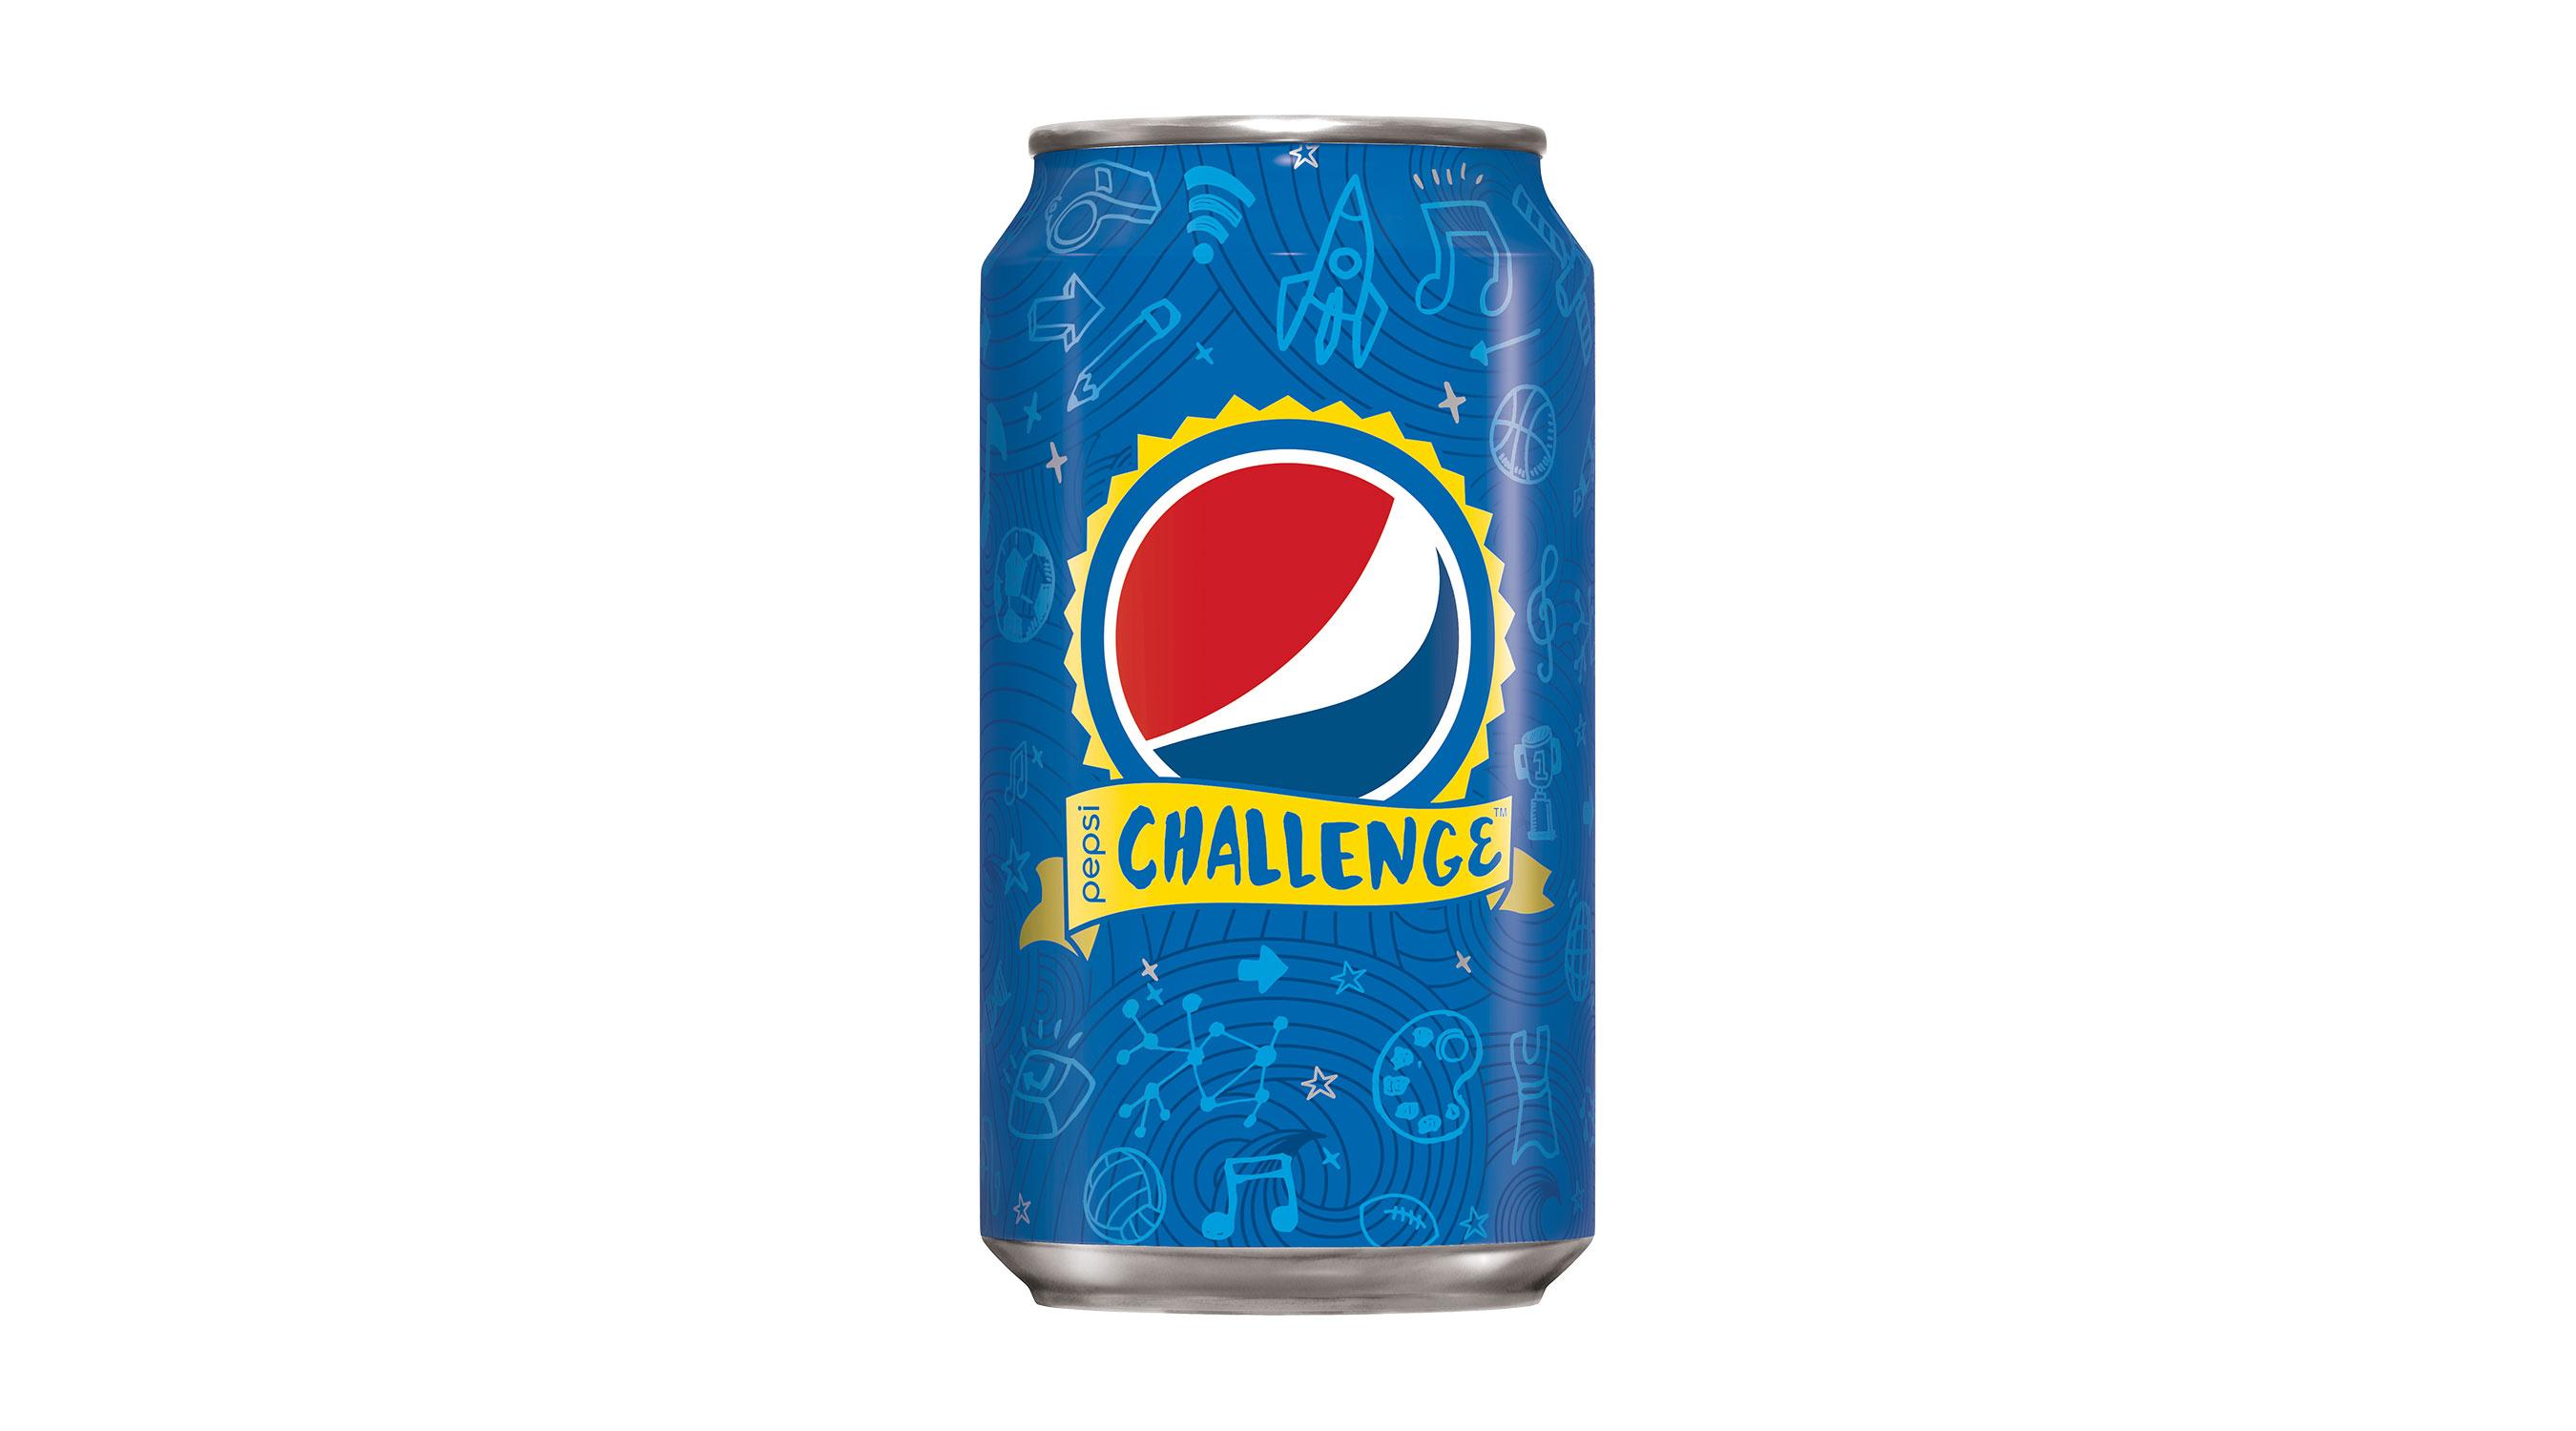 pepsi challenge can